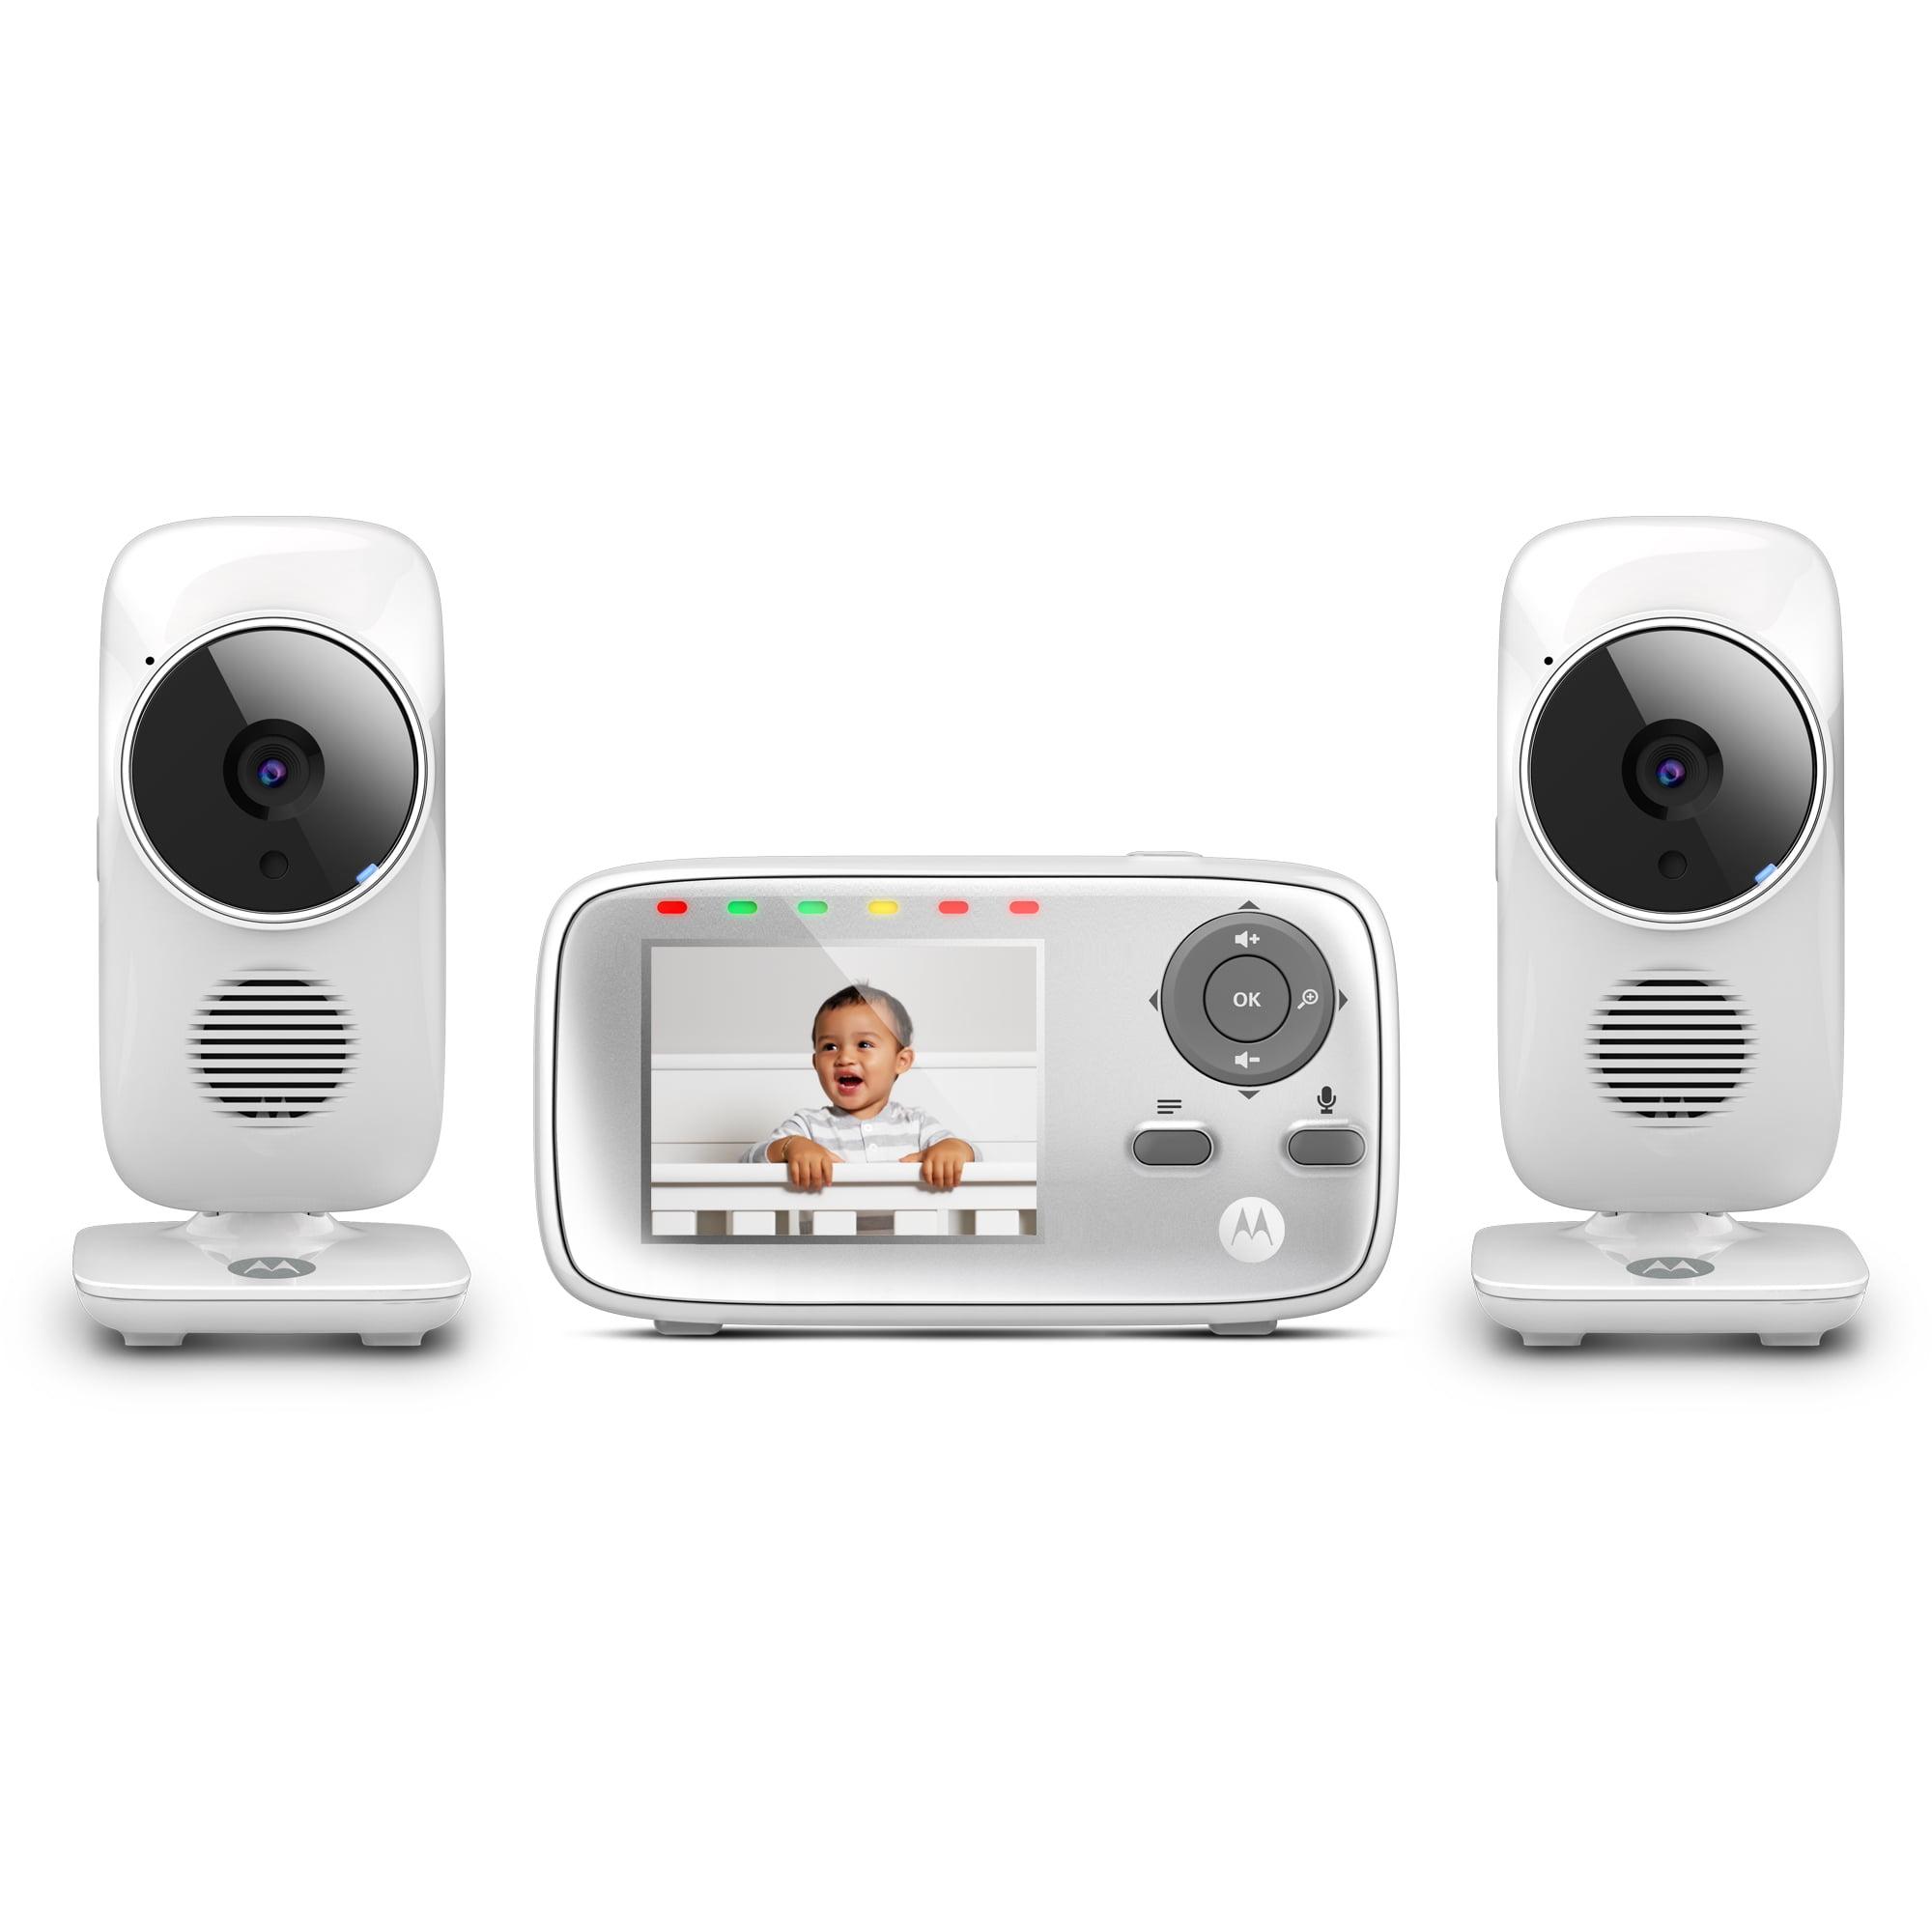 Motorola MB483-2, Video Baby Monitor, 2 Cameras by Motorola